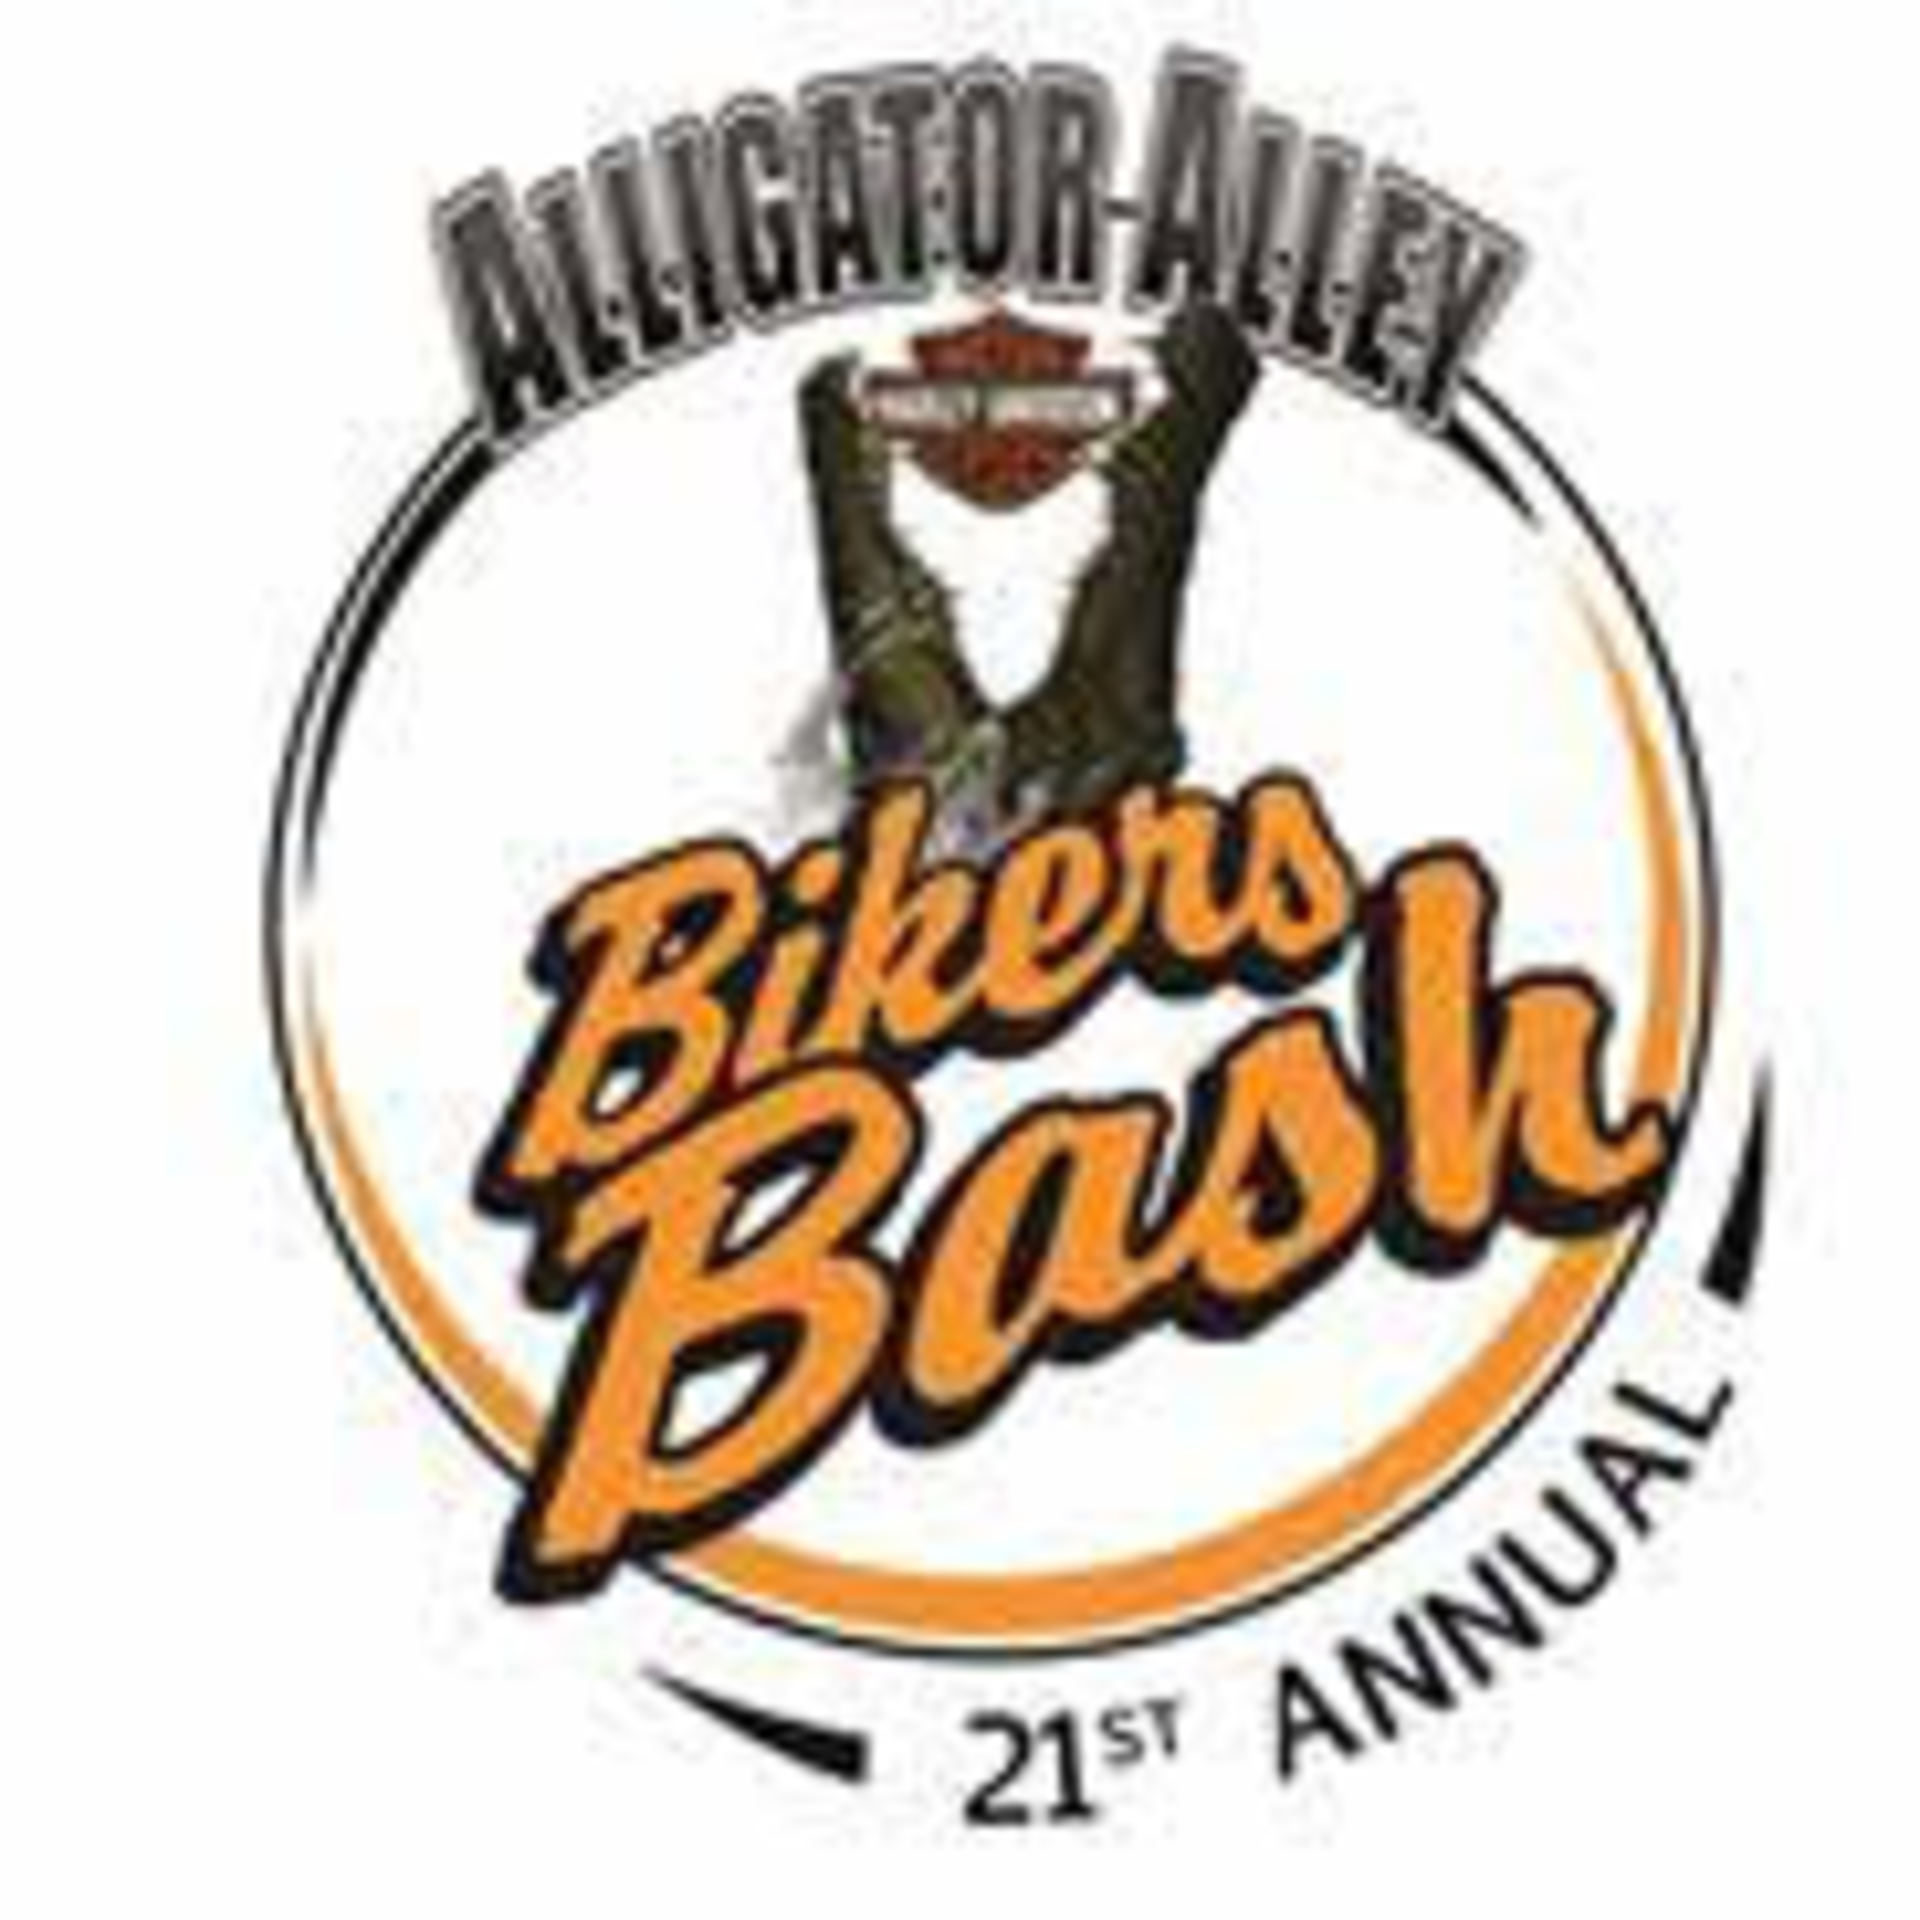 21st Annual Alligator Alley's Harley-Davidson Bikers Bash